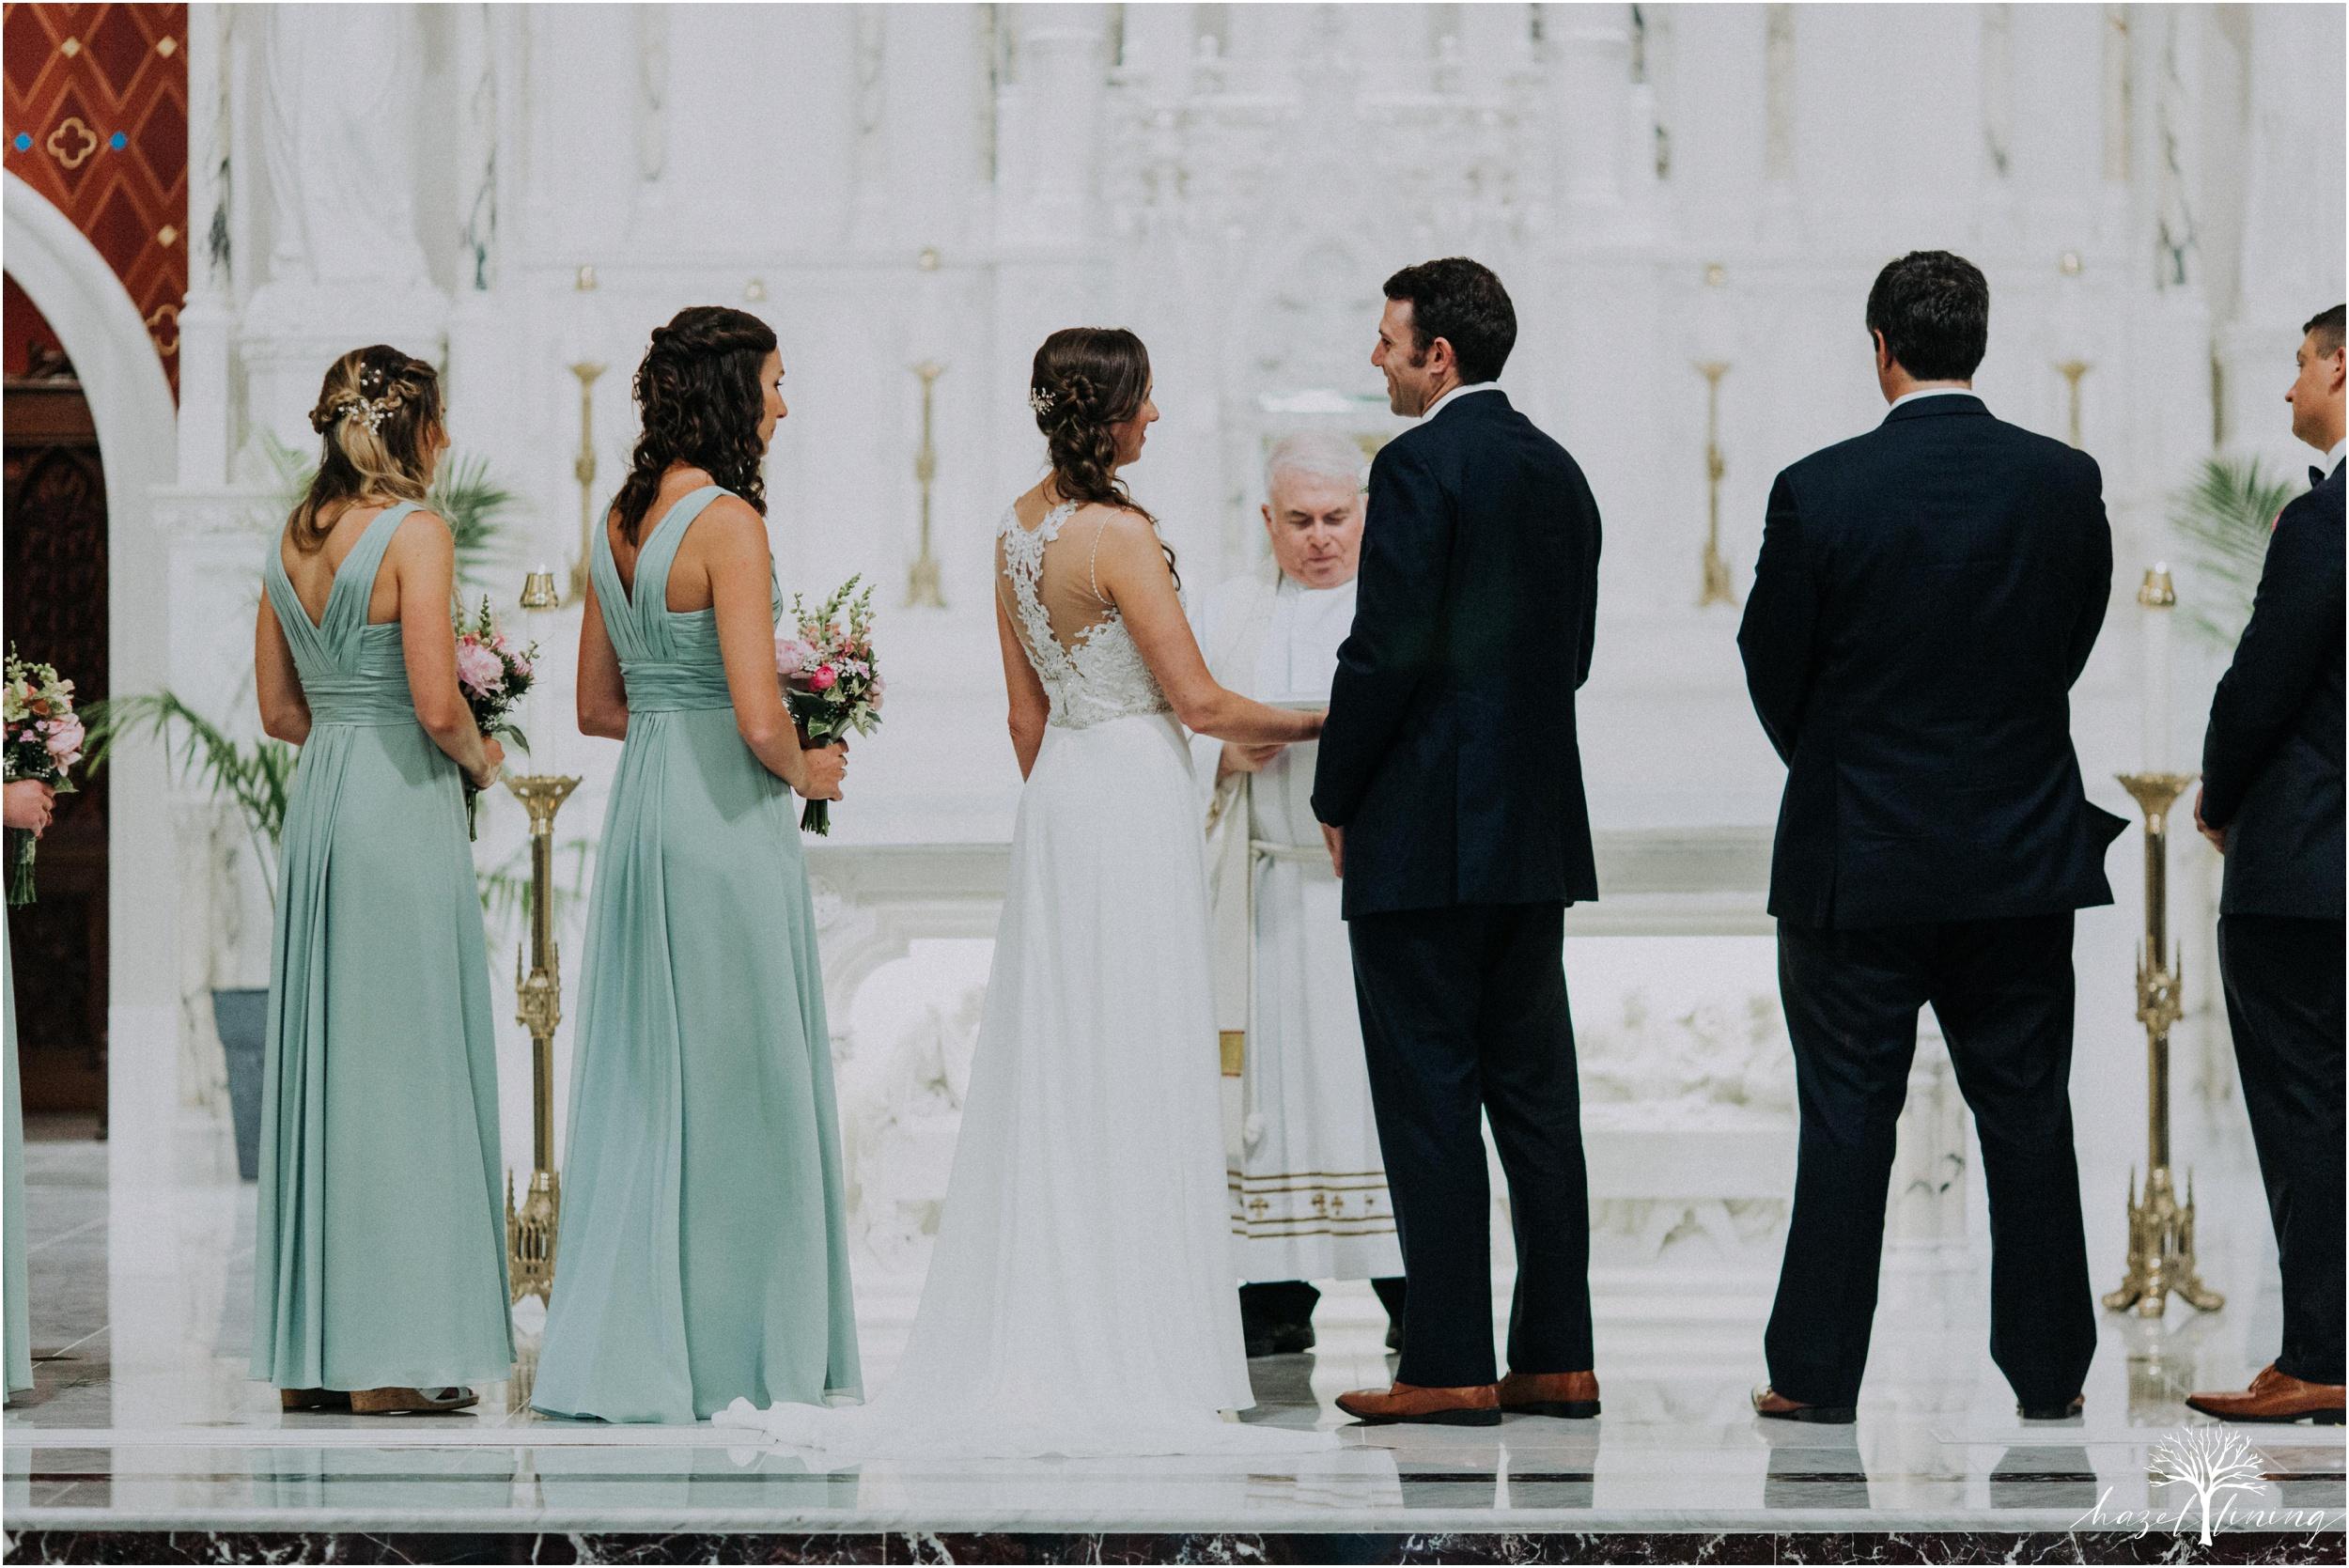 hazel-lining-travel-wedding-elopement-photography_0059.jpg